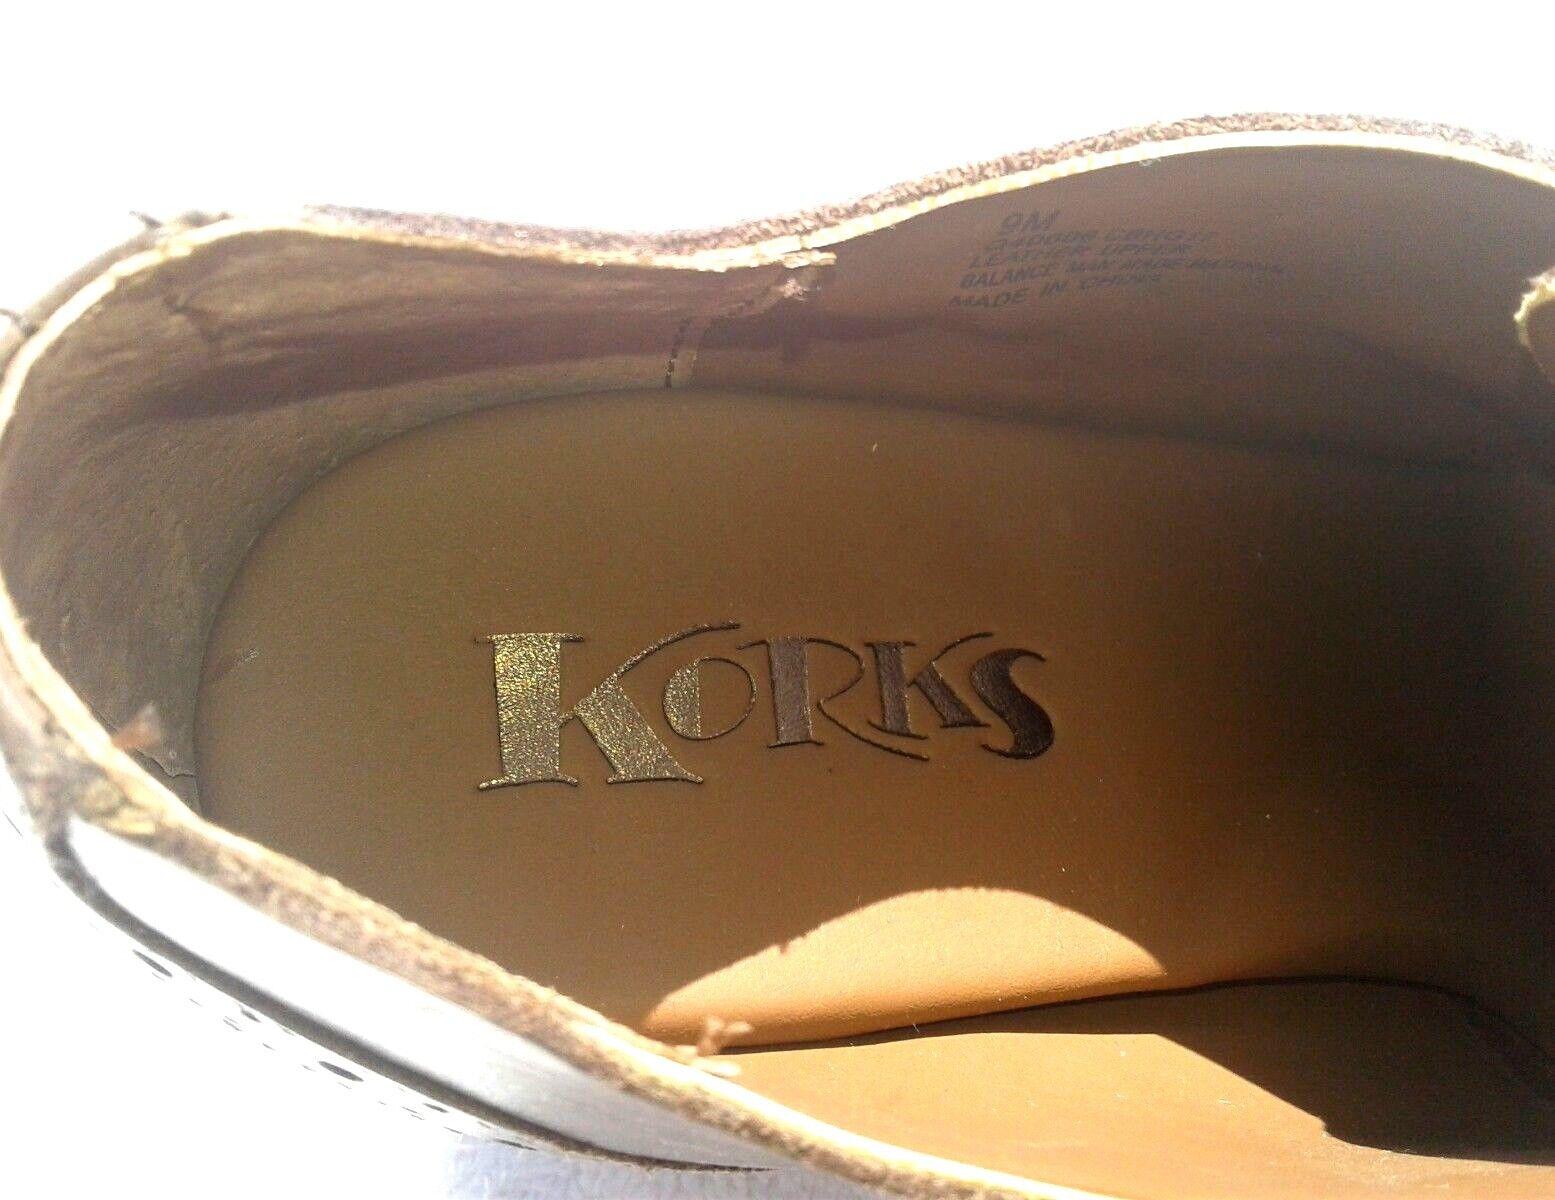 KORKS by Kork-Ease WITHROW Dark braun Größe 9 - - 9 NWB eb7ba3